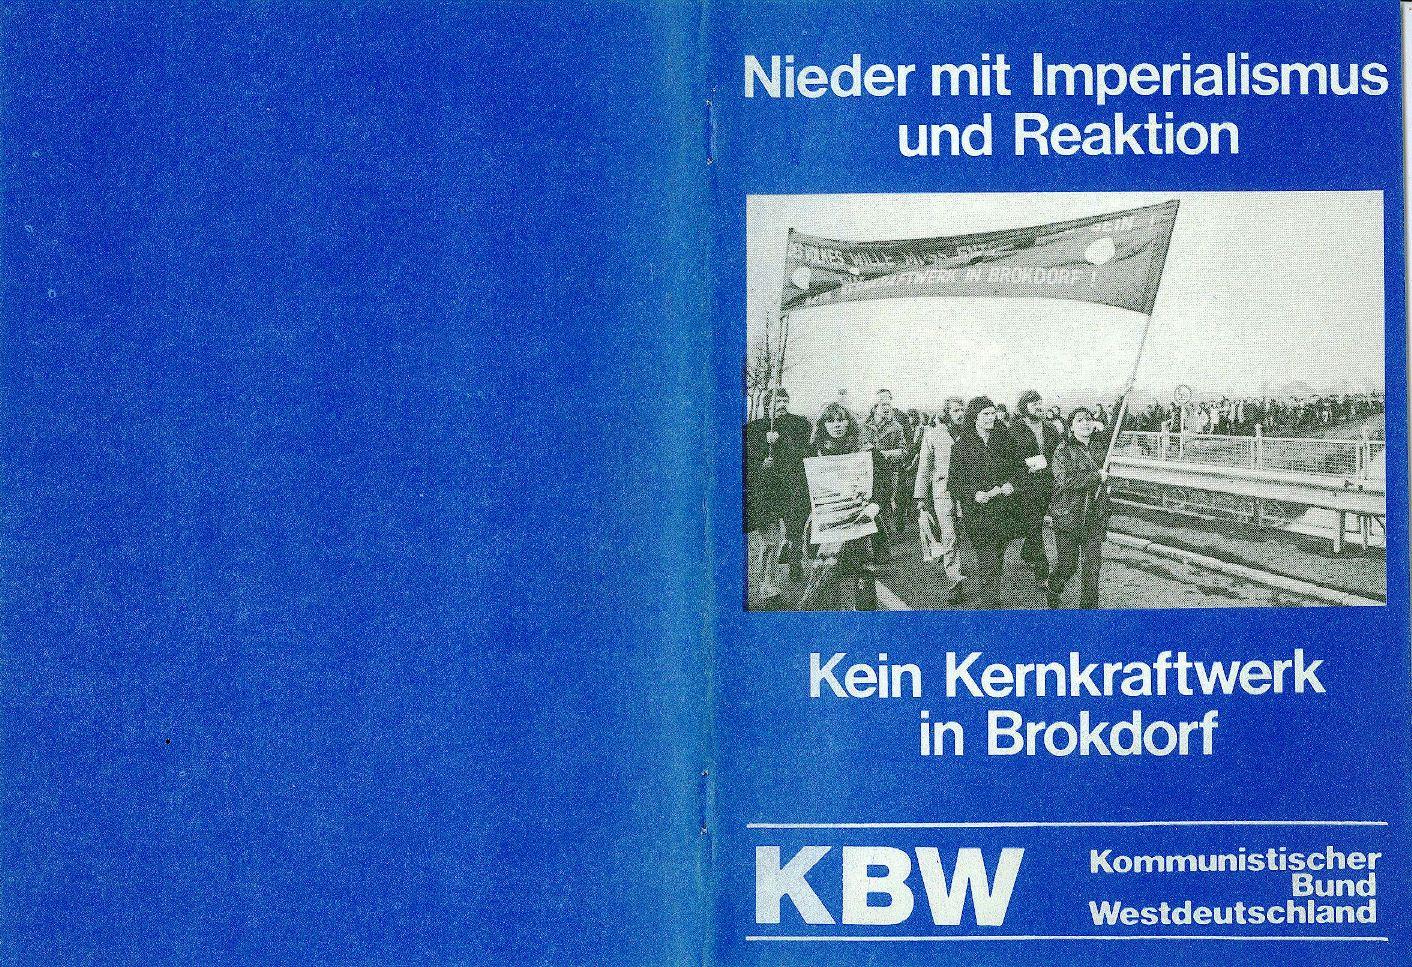 Brokdorf_KBW001